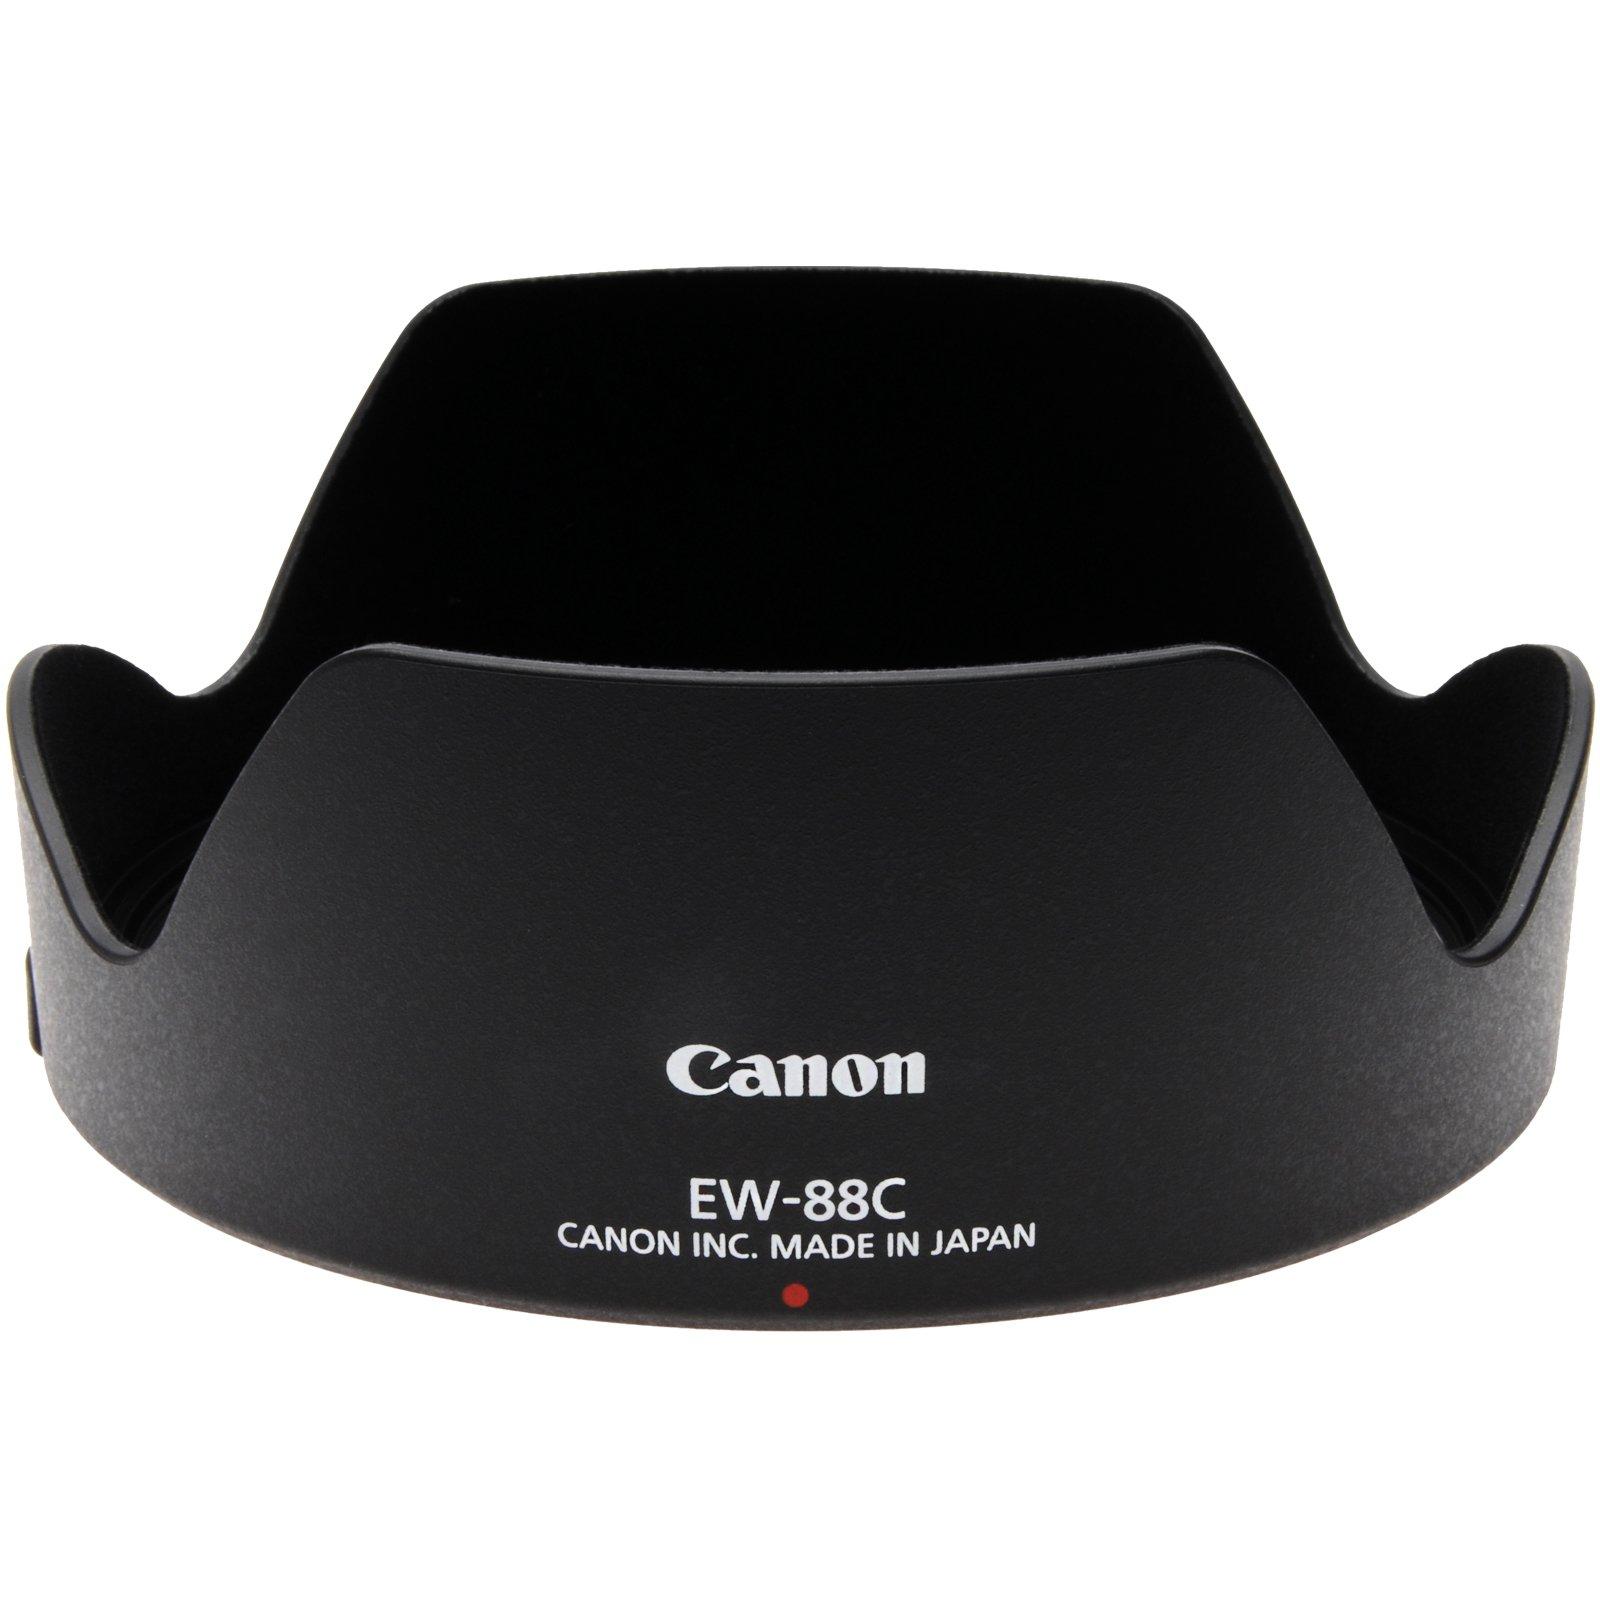 Canon EW-88C Lens Hood for EF 24-70mm f/2.8L II USM by Canon